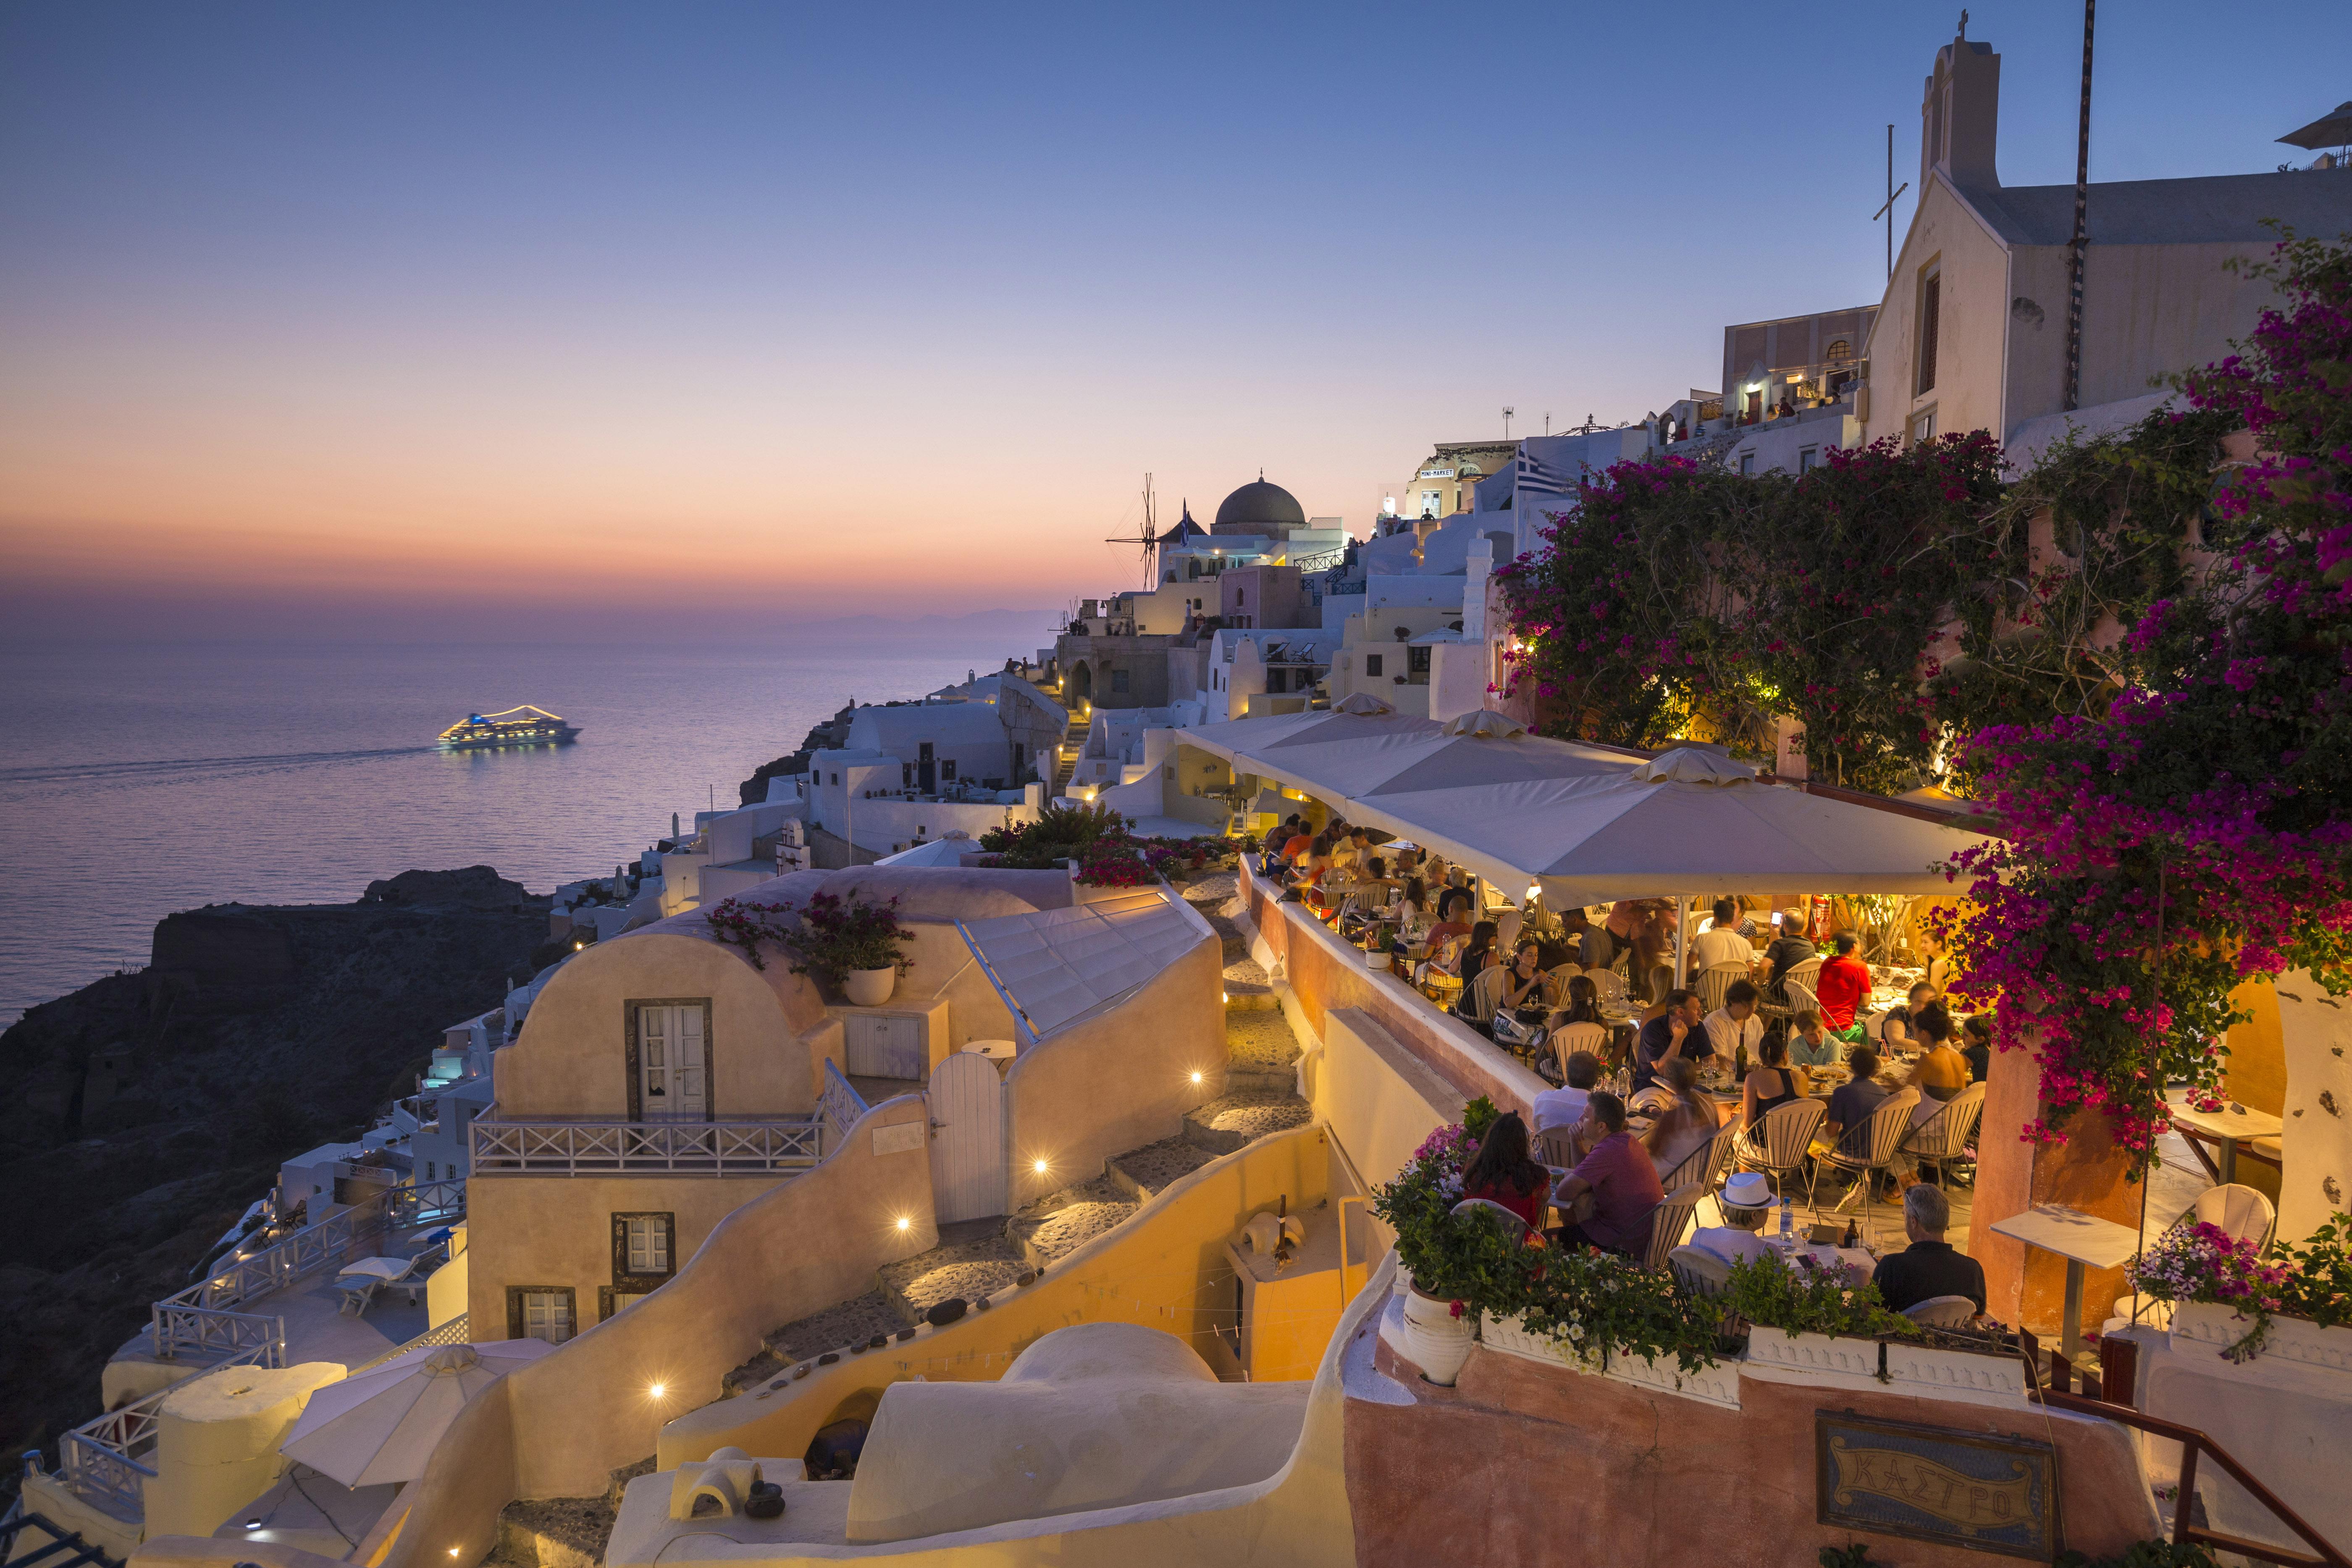 Greece, Cyclades Islands, Santorini (Thira), Oia, village with view on sea